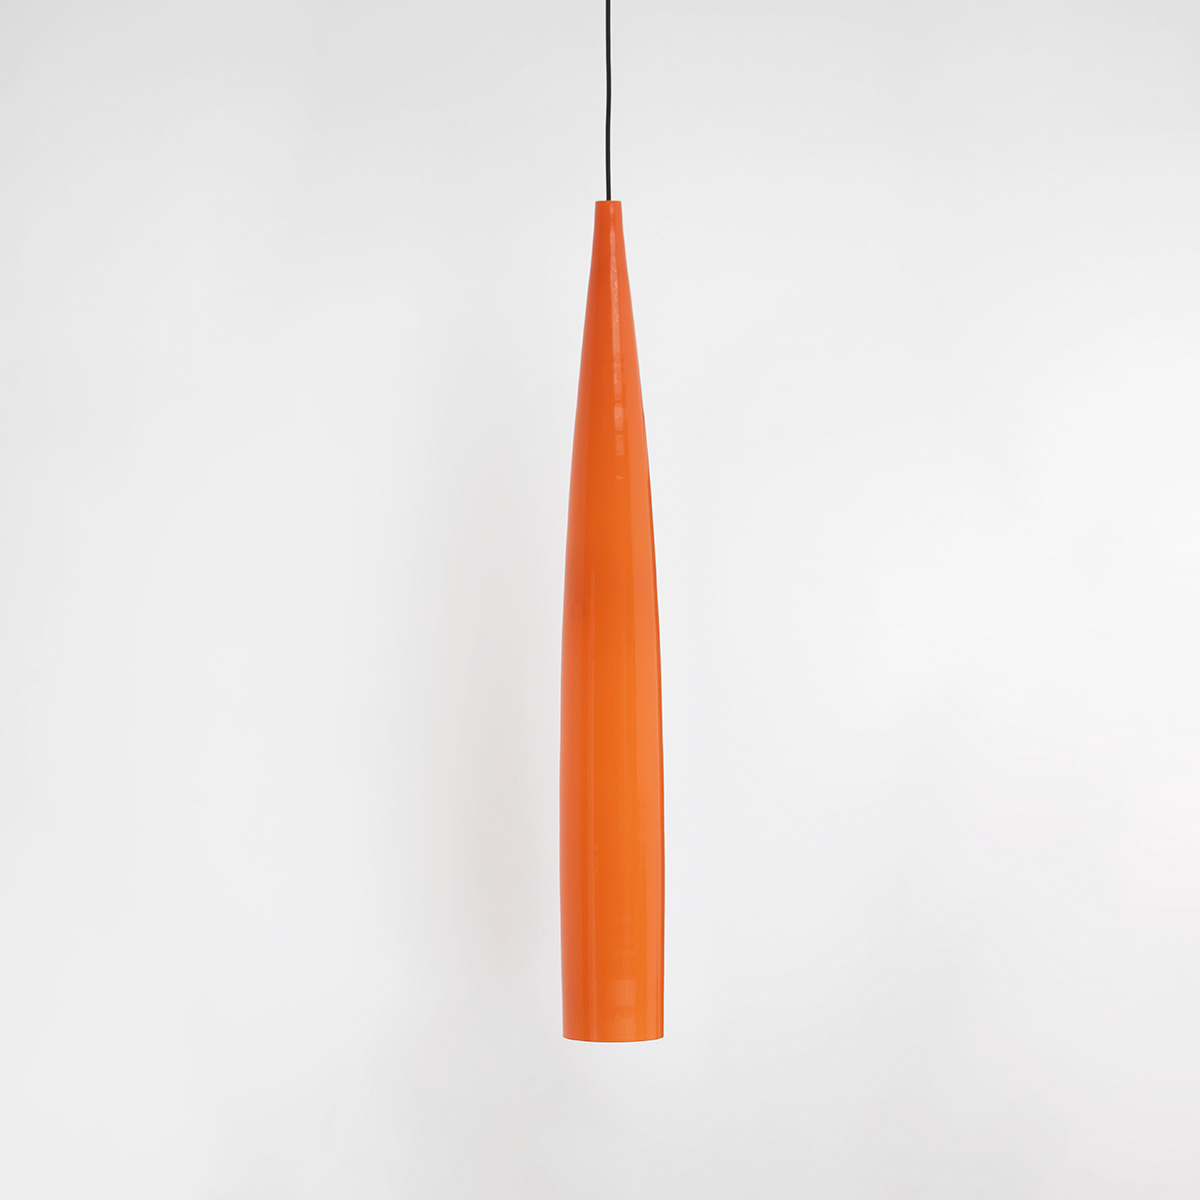 Orange tube pendant lamp by Gino Vistosi